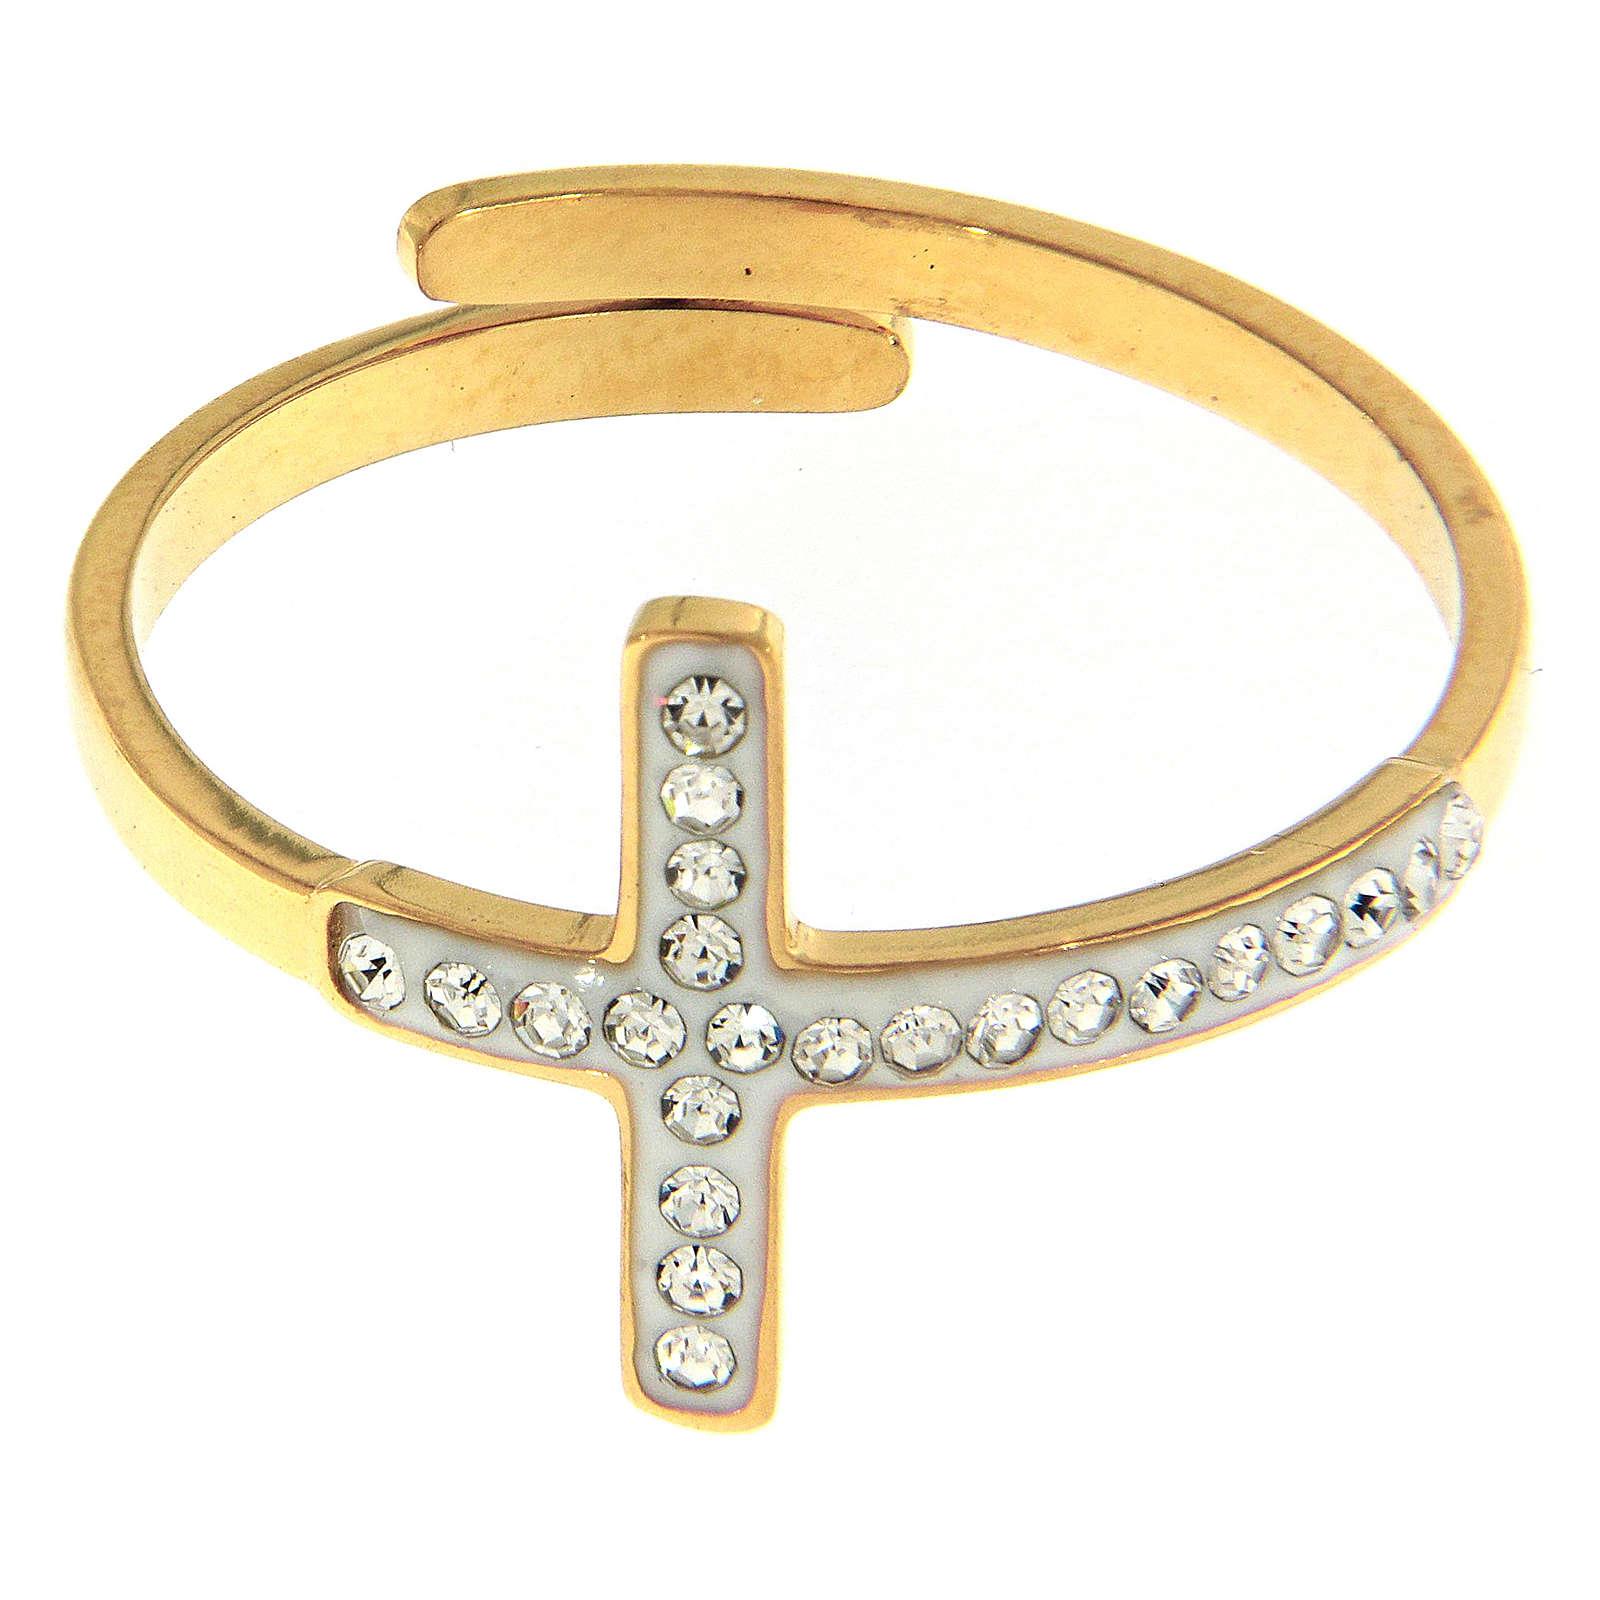 Bague Medjugorje acier doré croix argentée 4